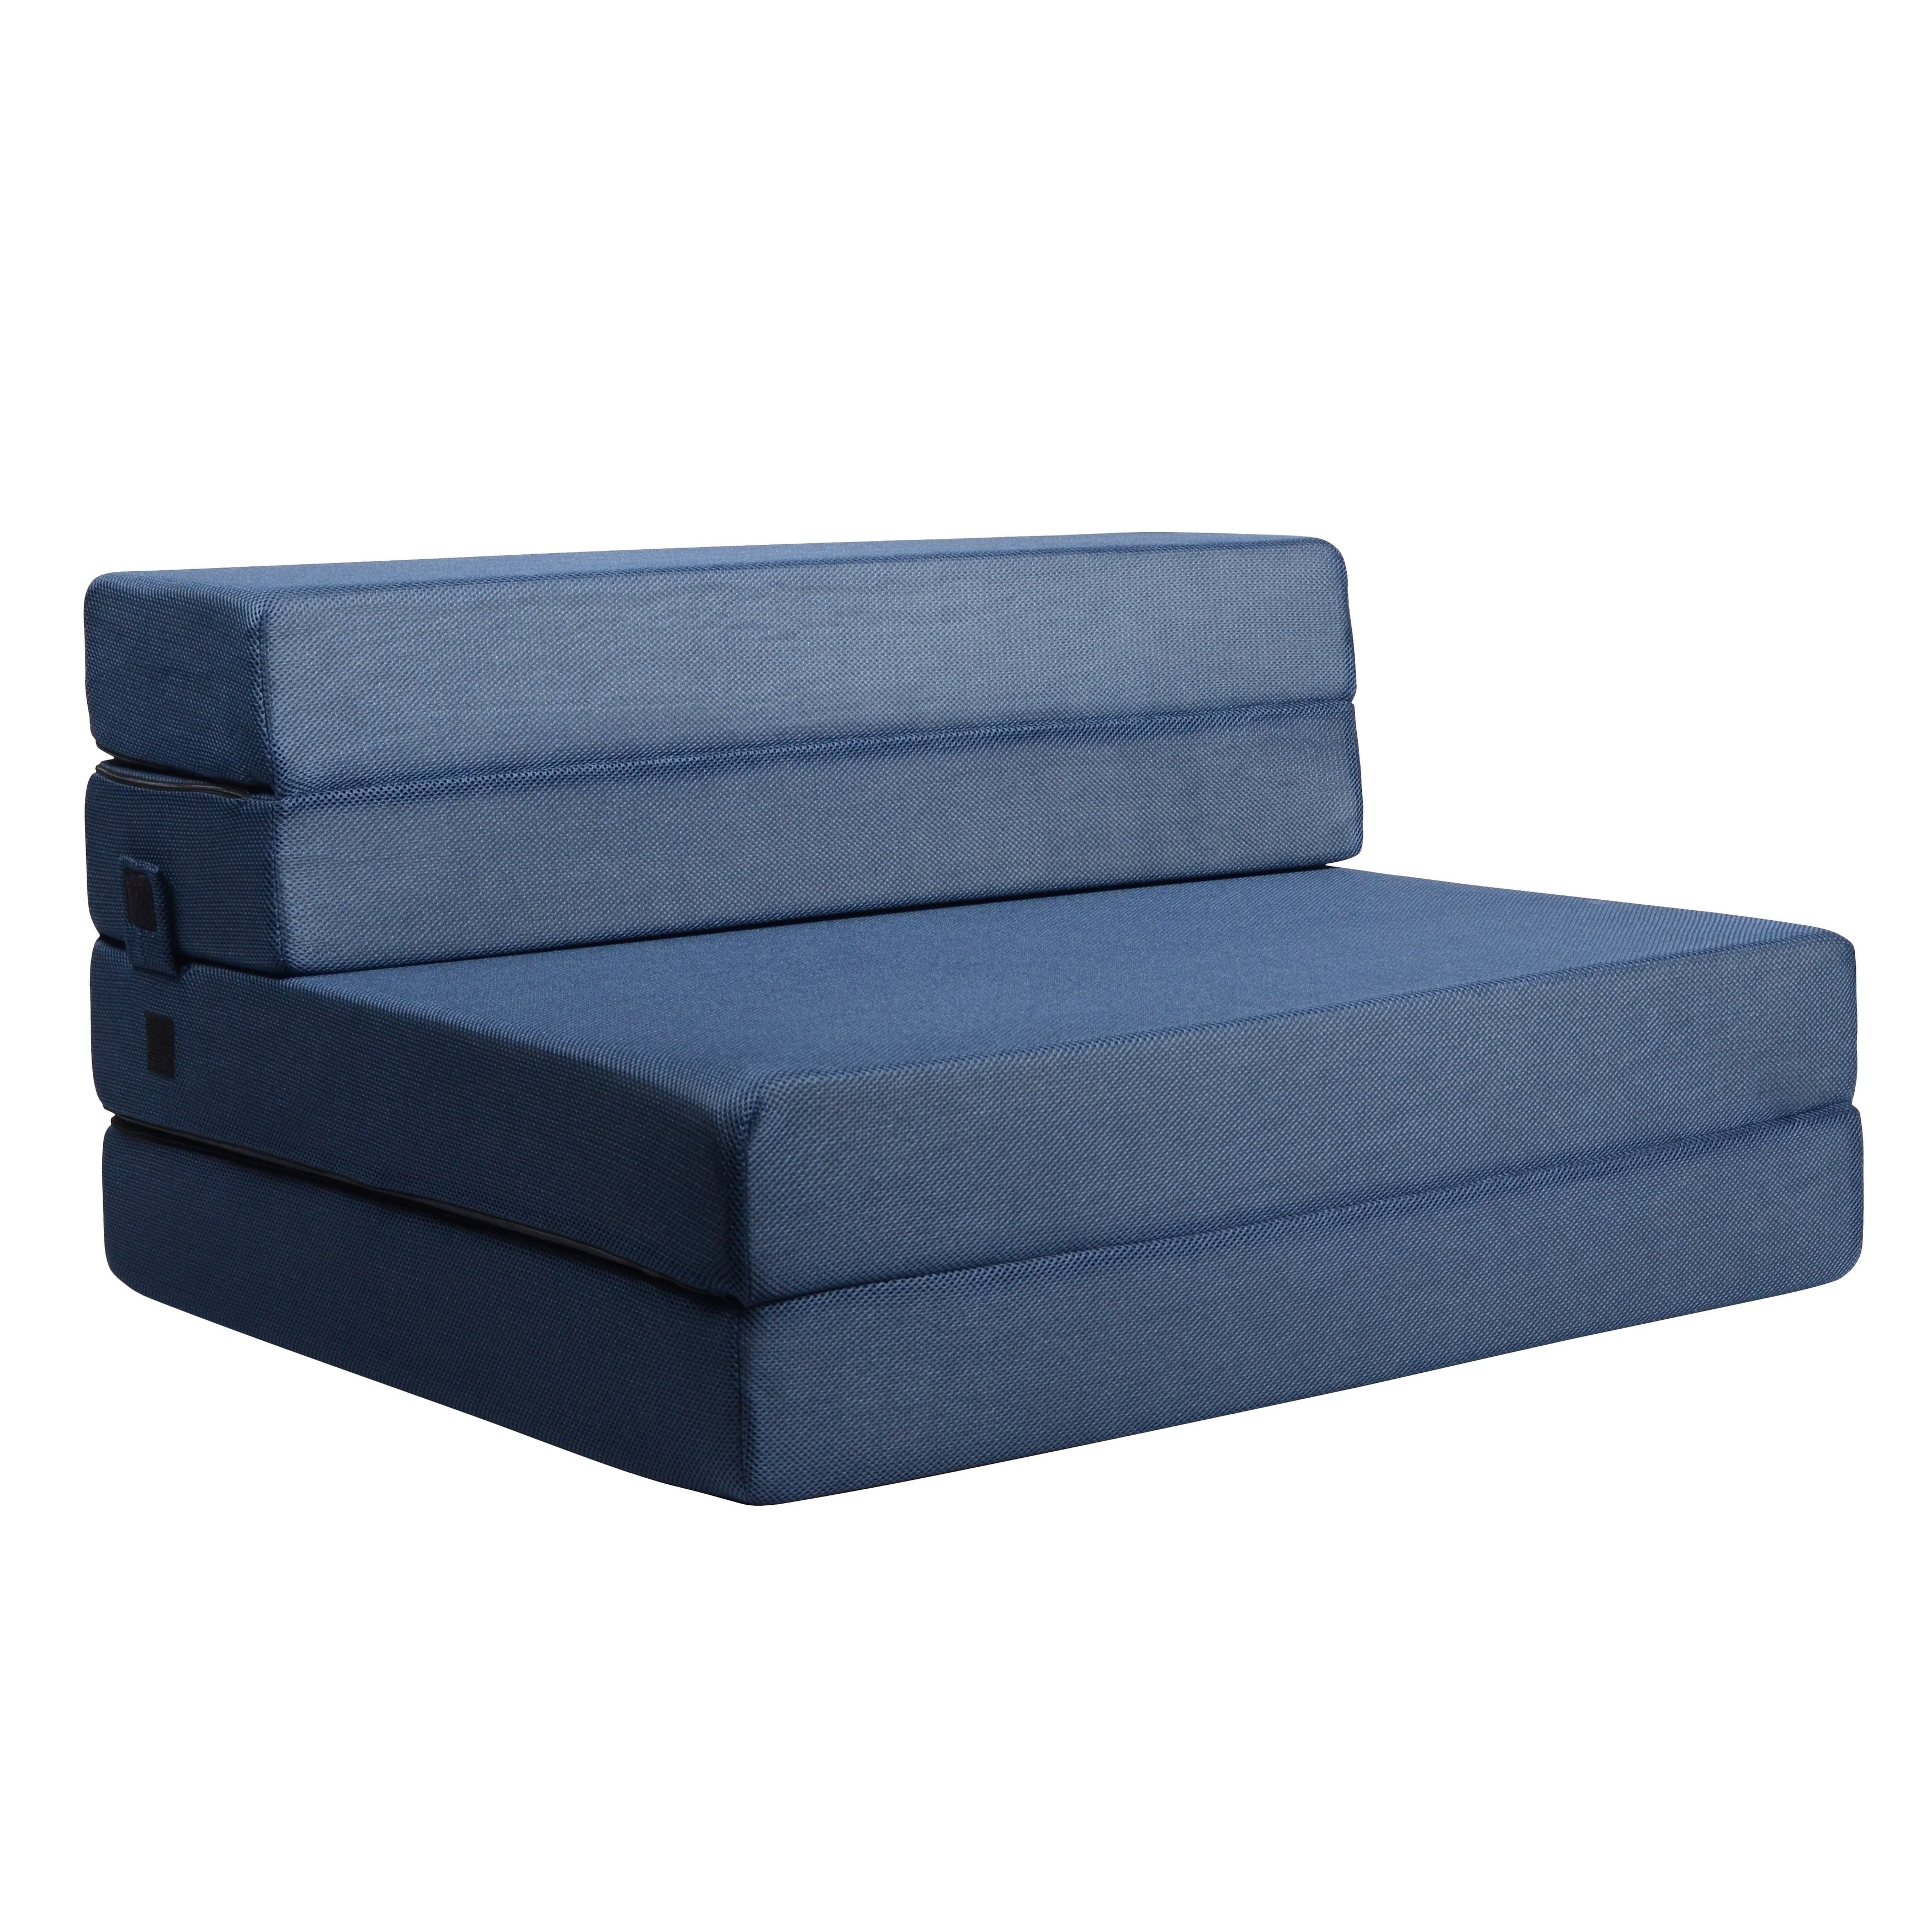 - Shop Milliard 4.5-inch Tri-Fold Twin XL Mattress And Sofa Bed